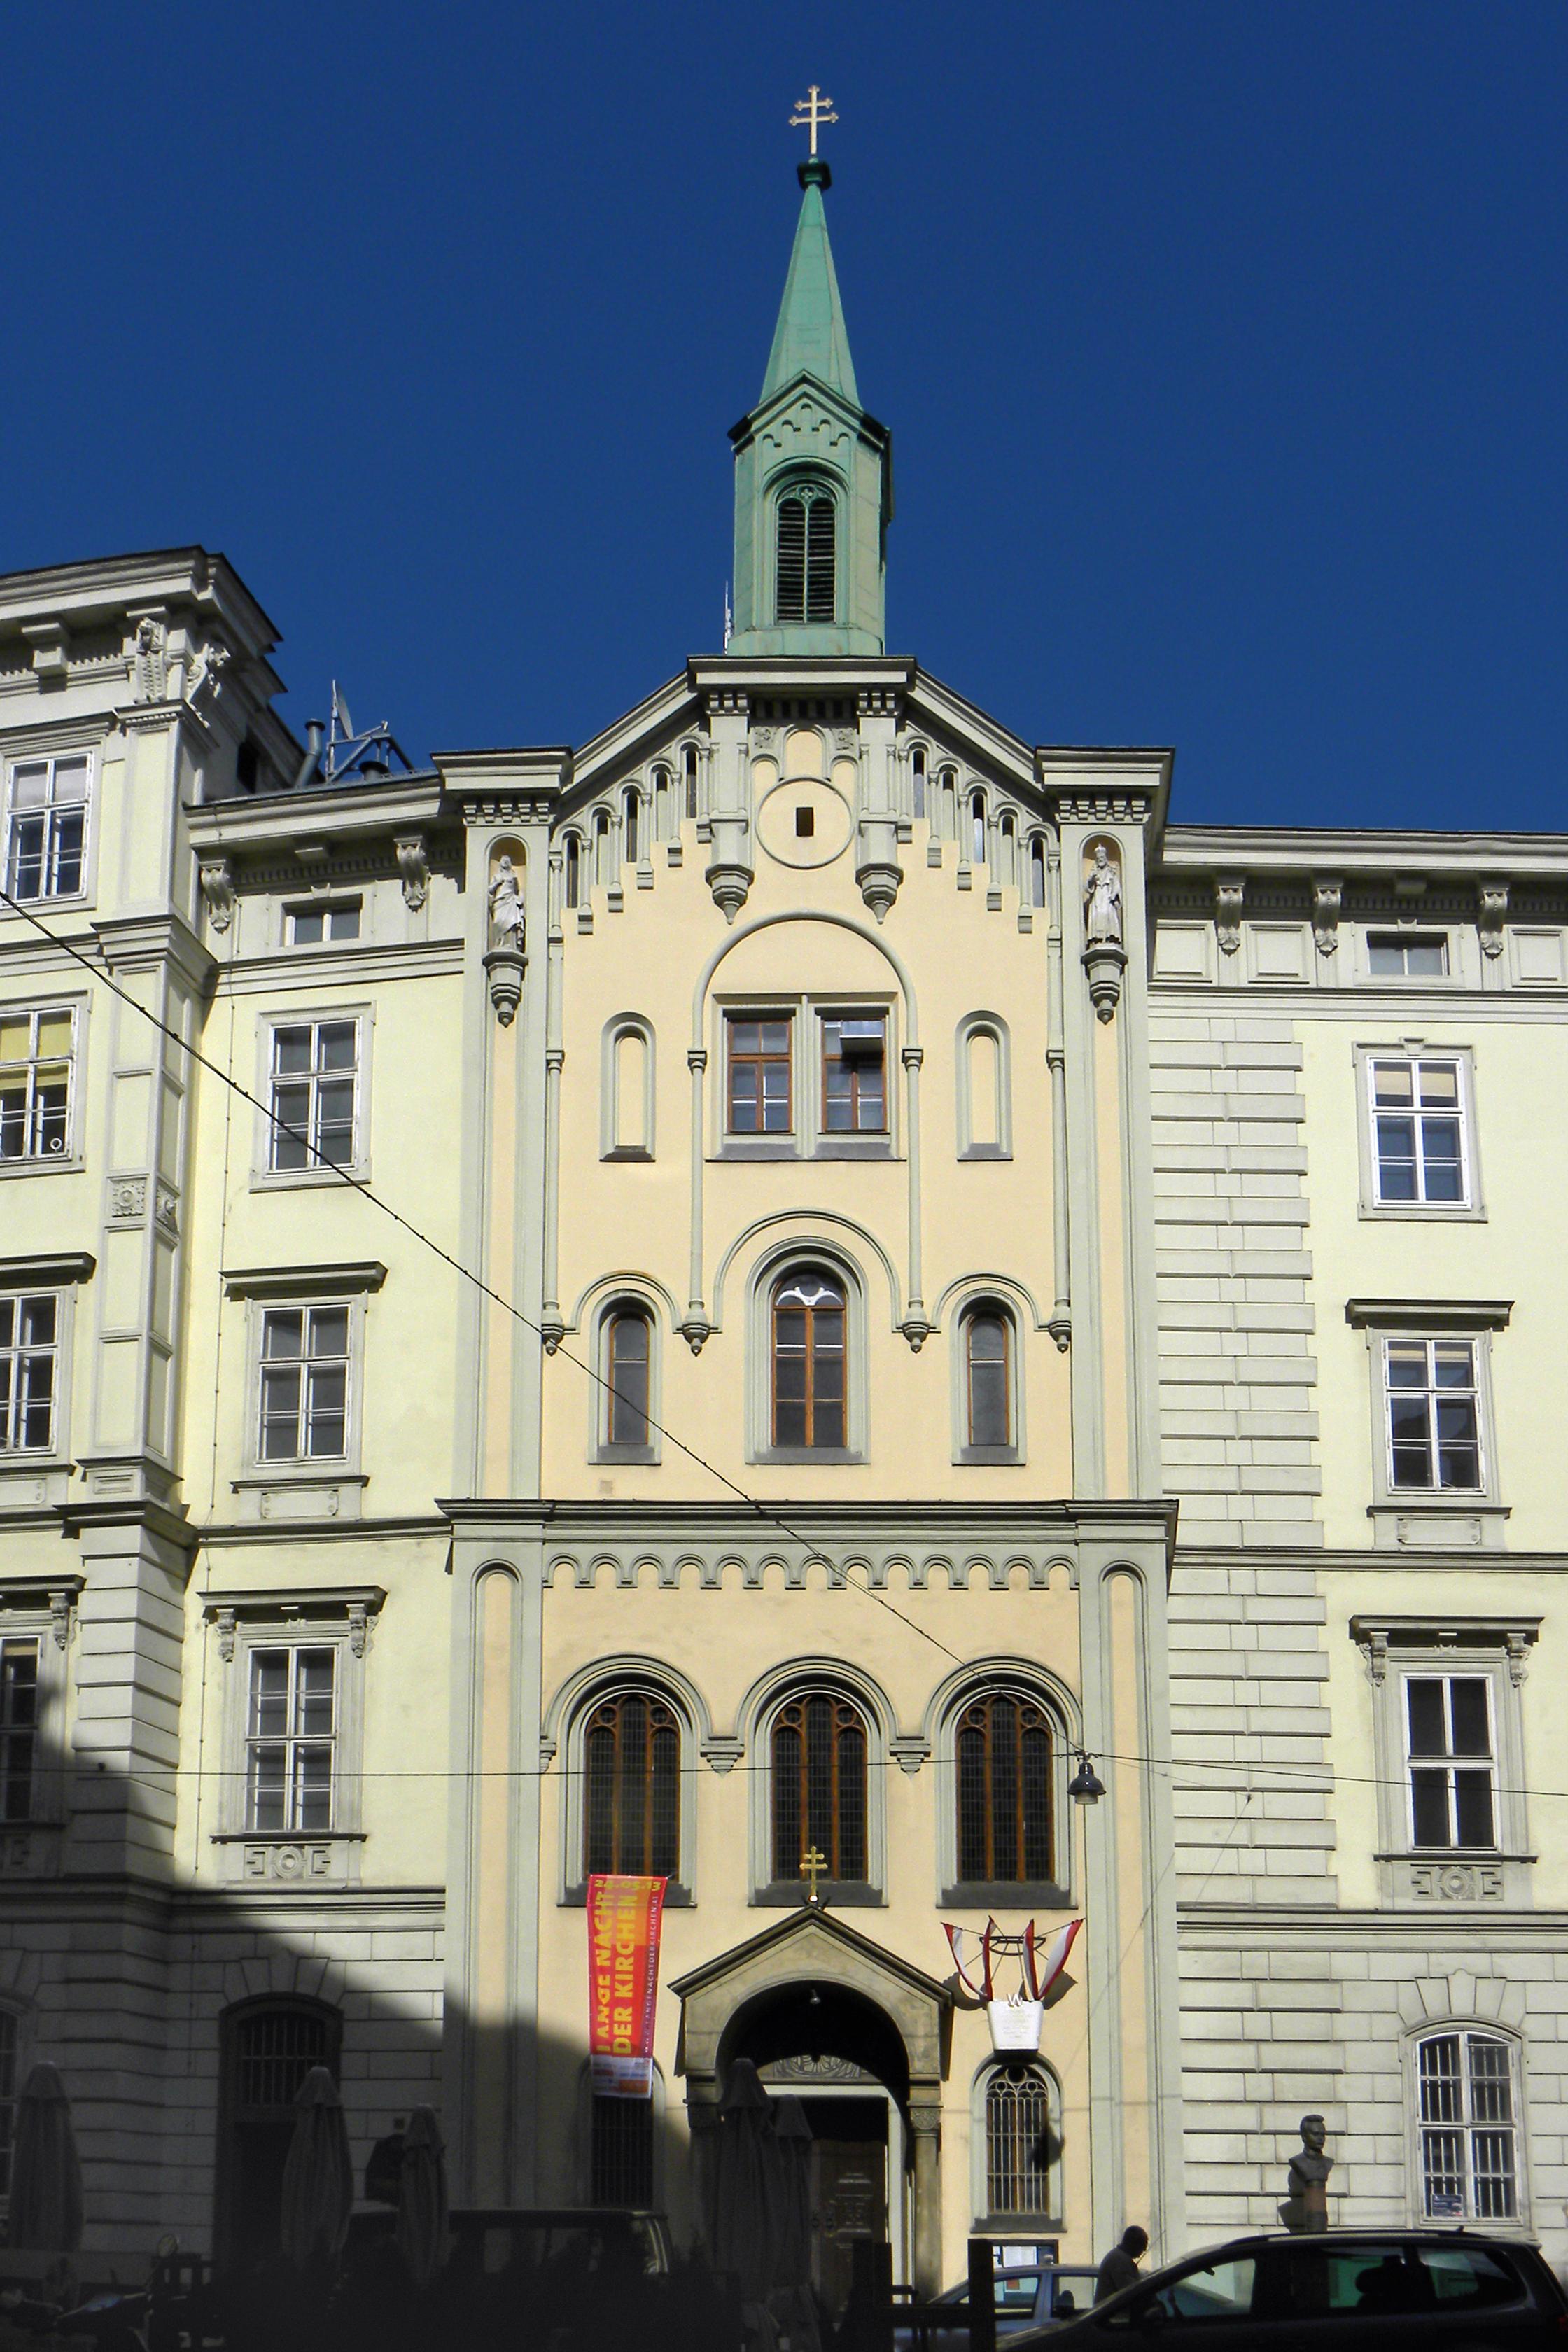 Wien-Innere Stadt - Postgasse - Barbarakirche.jpg